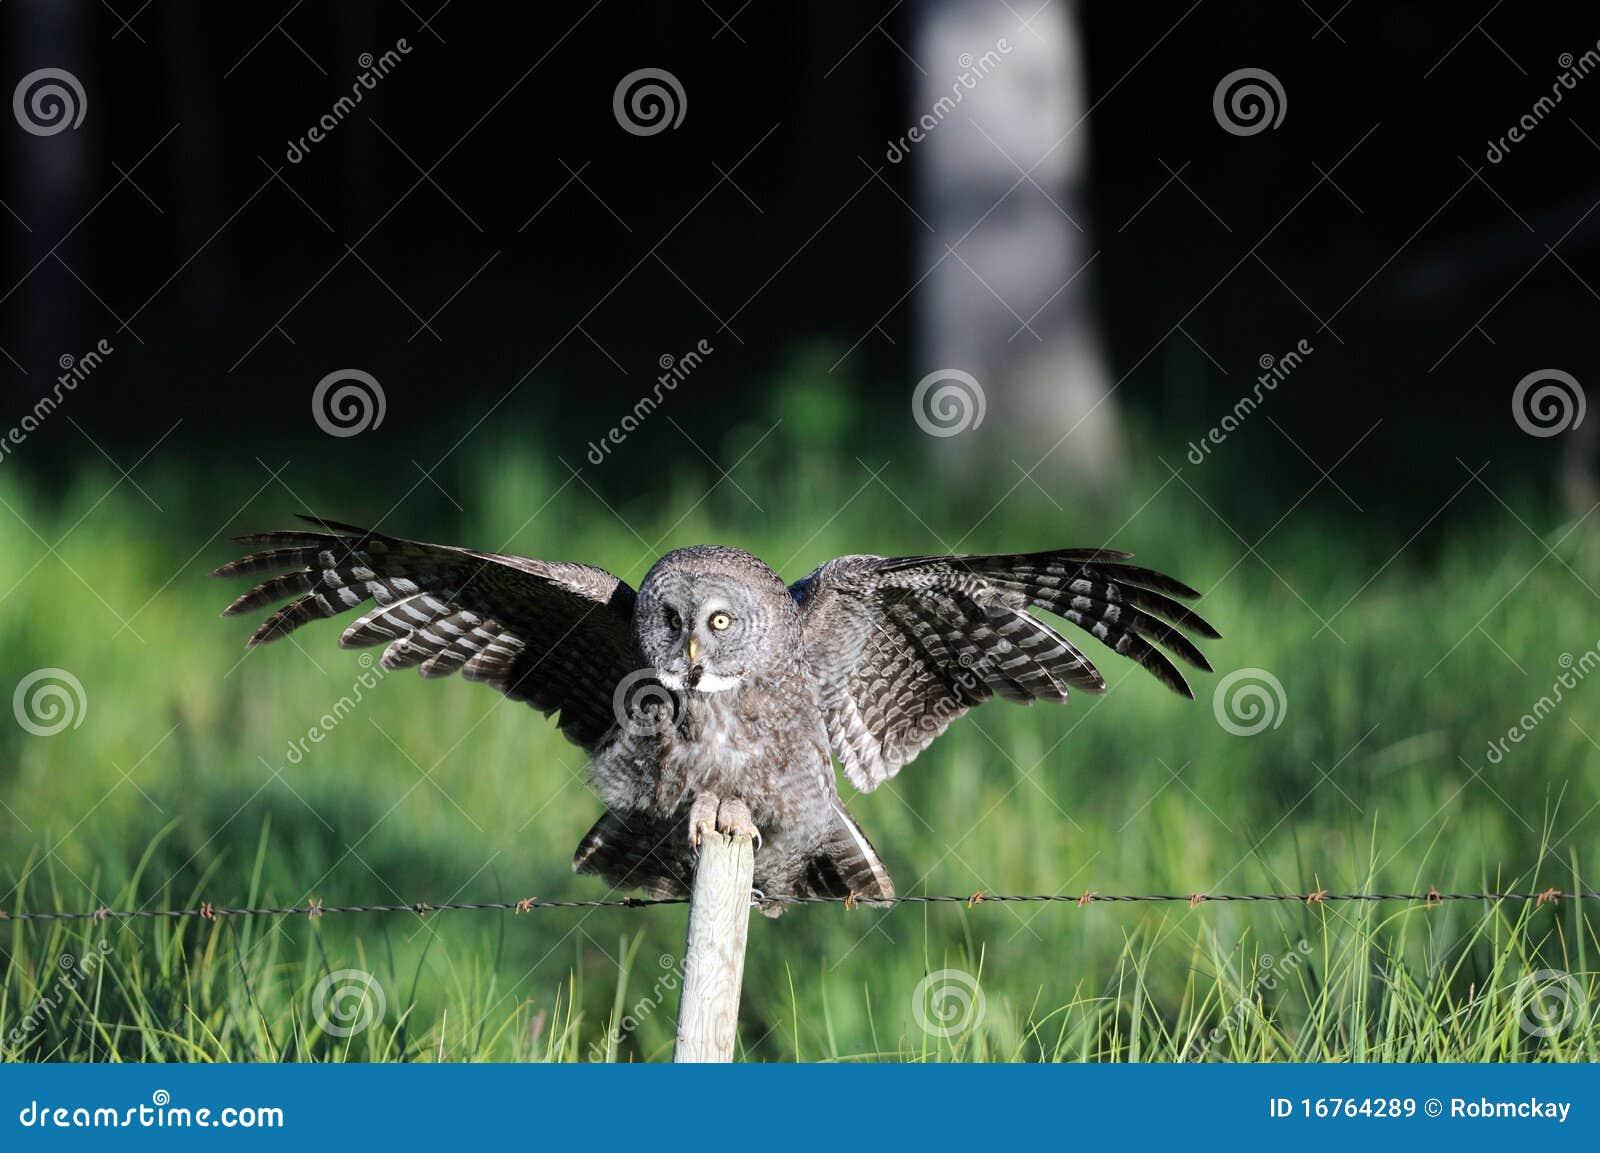 Great Grey Owl Landing on Post